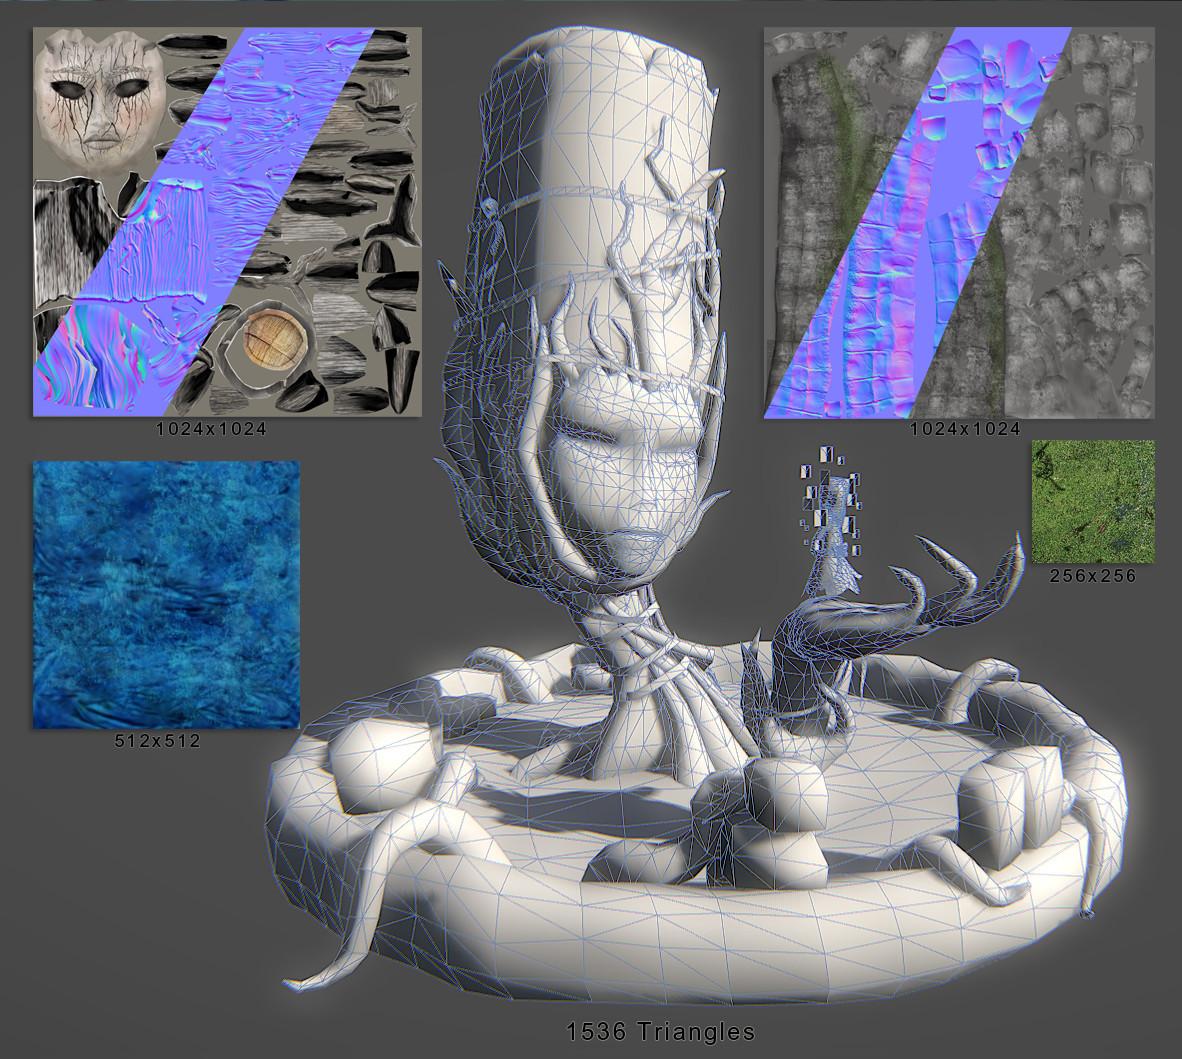 Paul lembcke ts texture proof